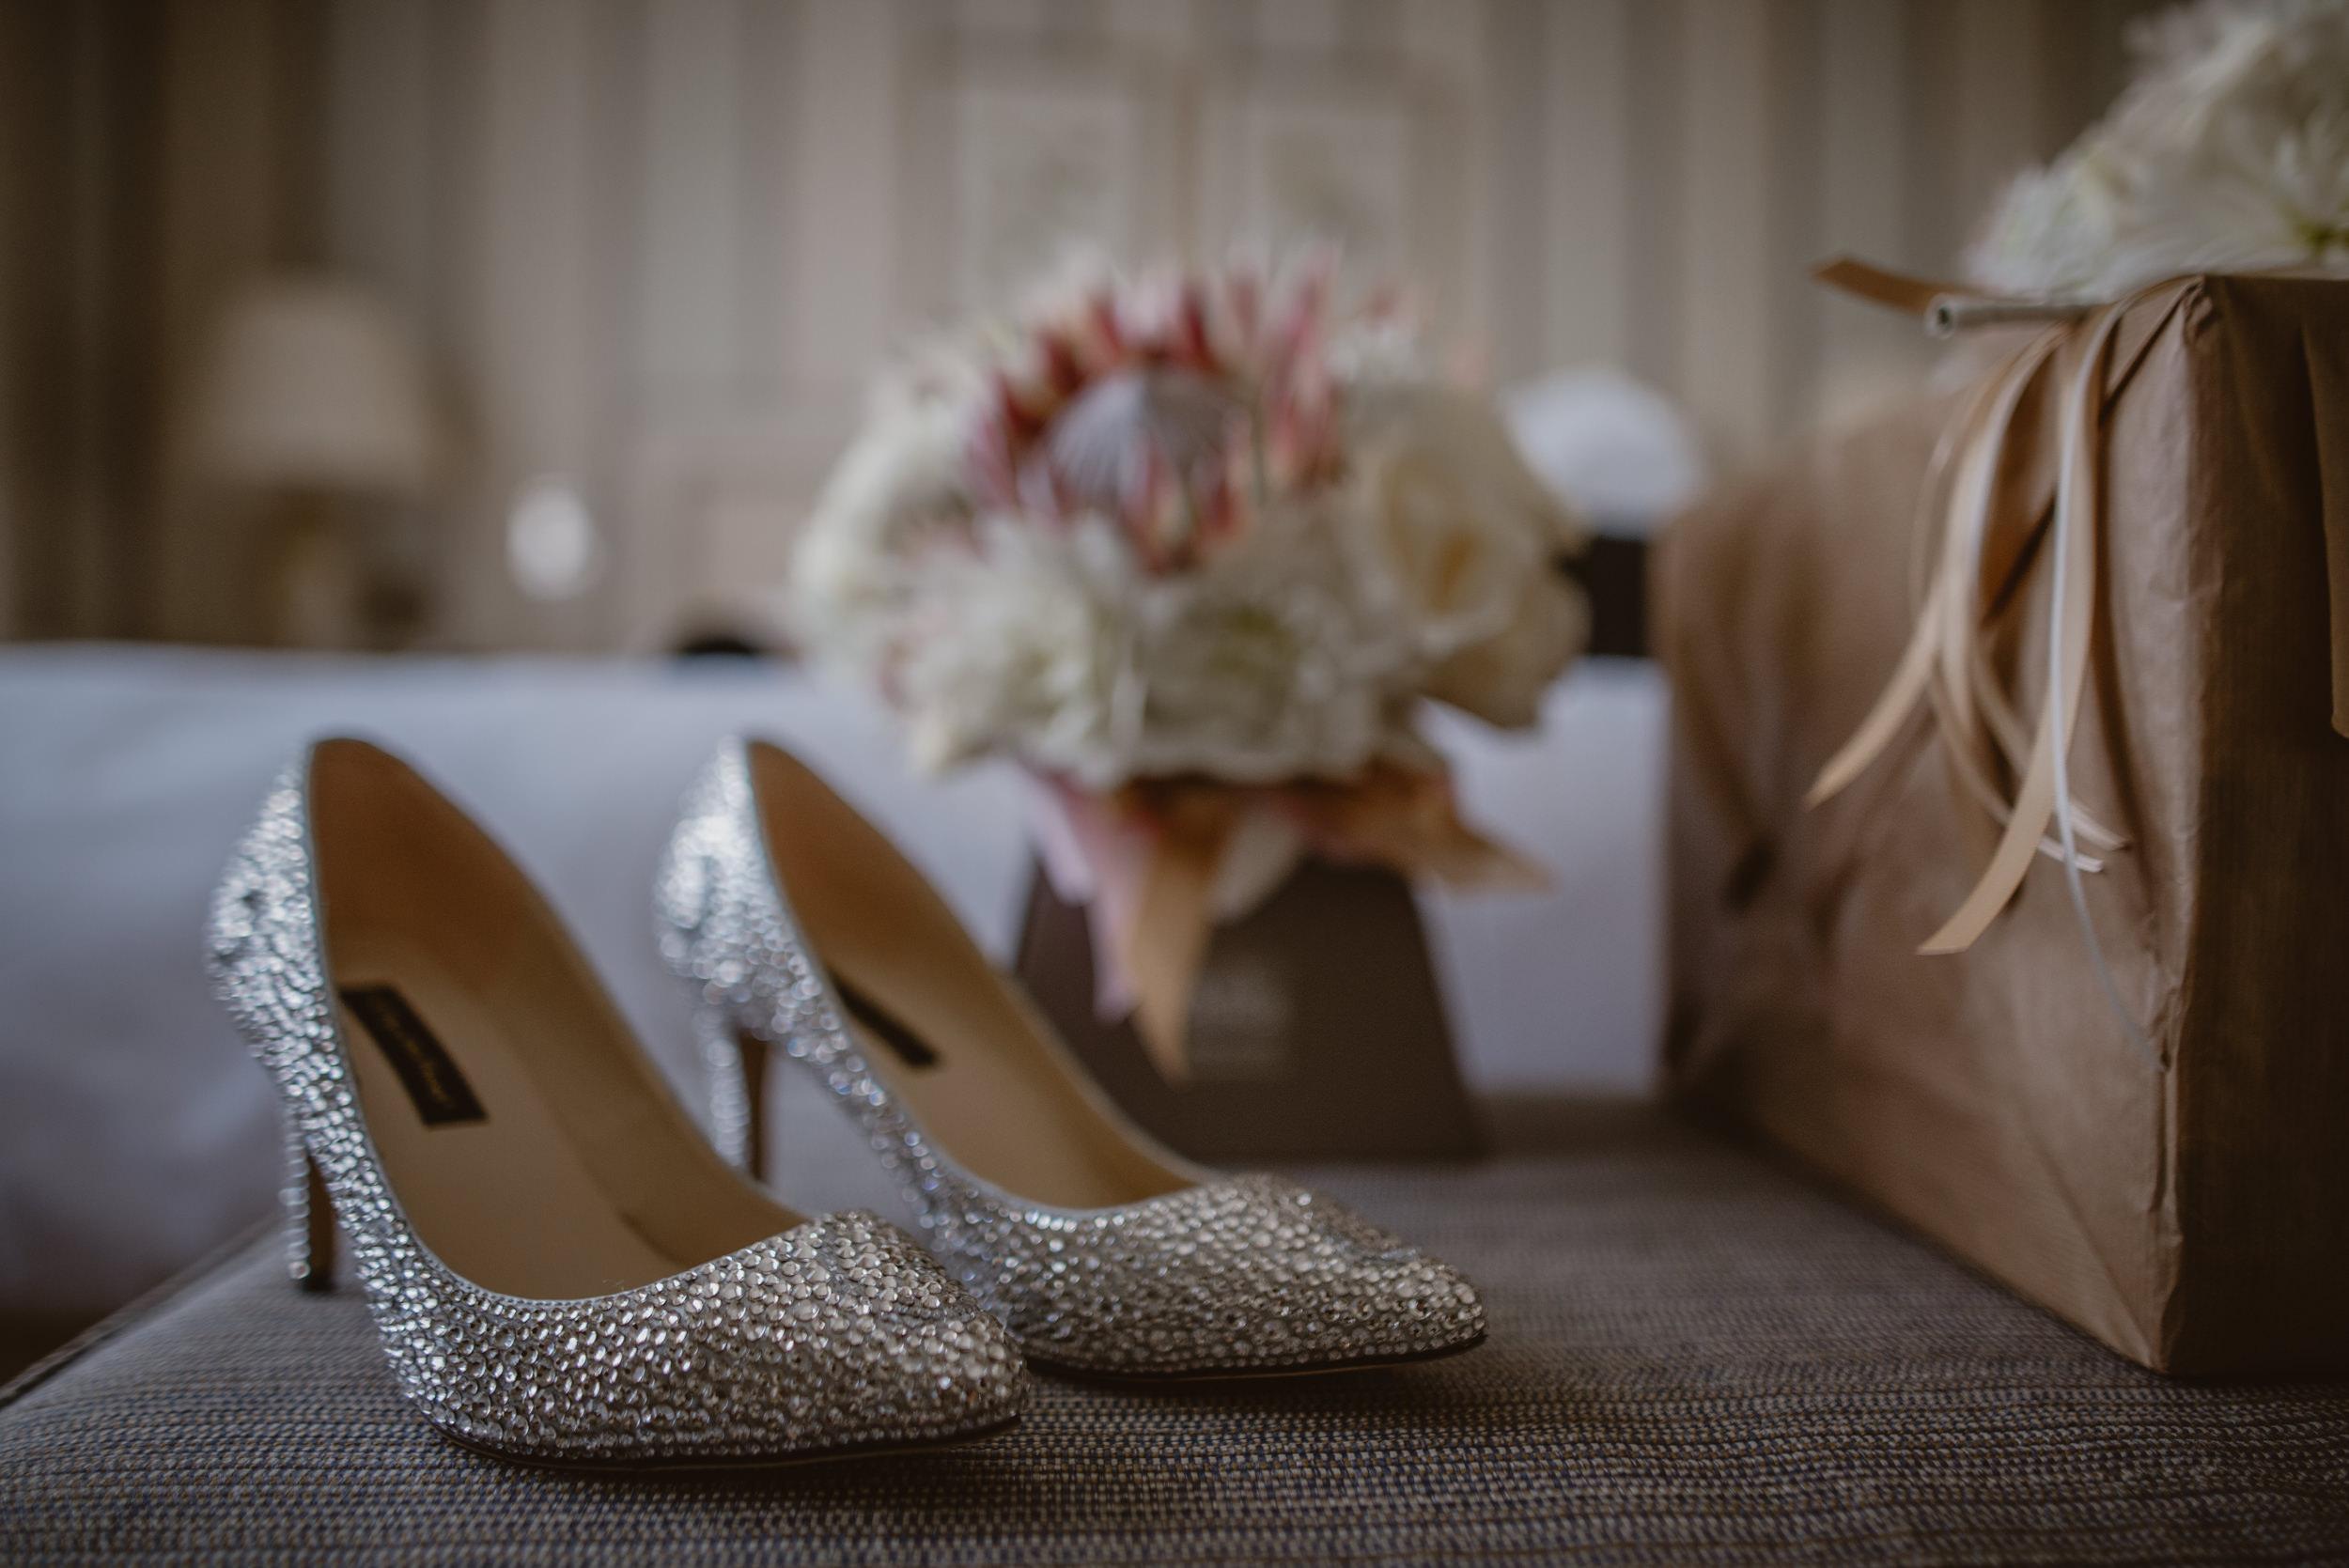 Trisha-and-Roger-wedding-The-Priory-Church-and-Chewton-Glen-Hotel-Christchurch-Manu-Mendoza-Wedding-Photography-017.jpg